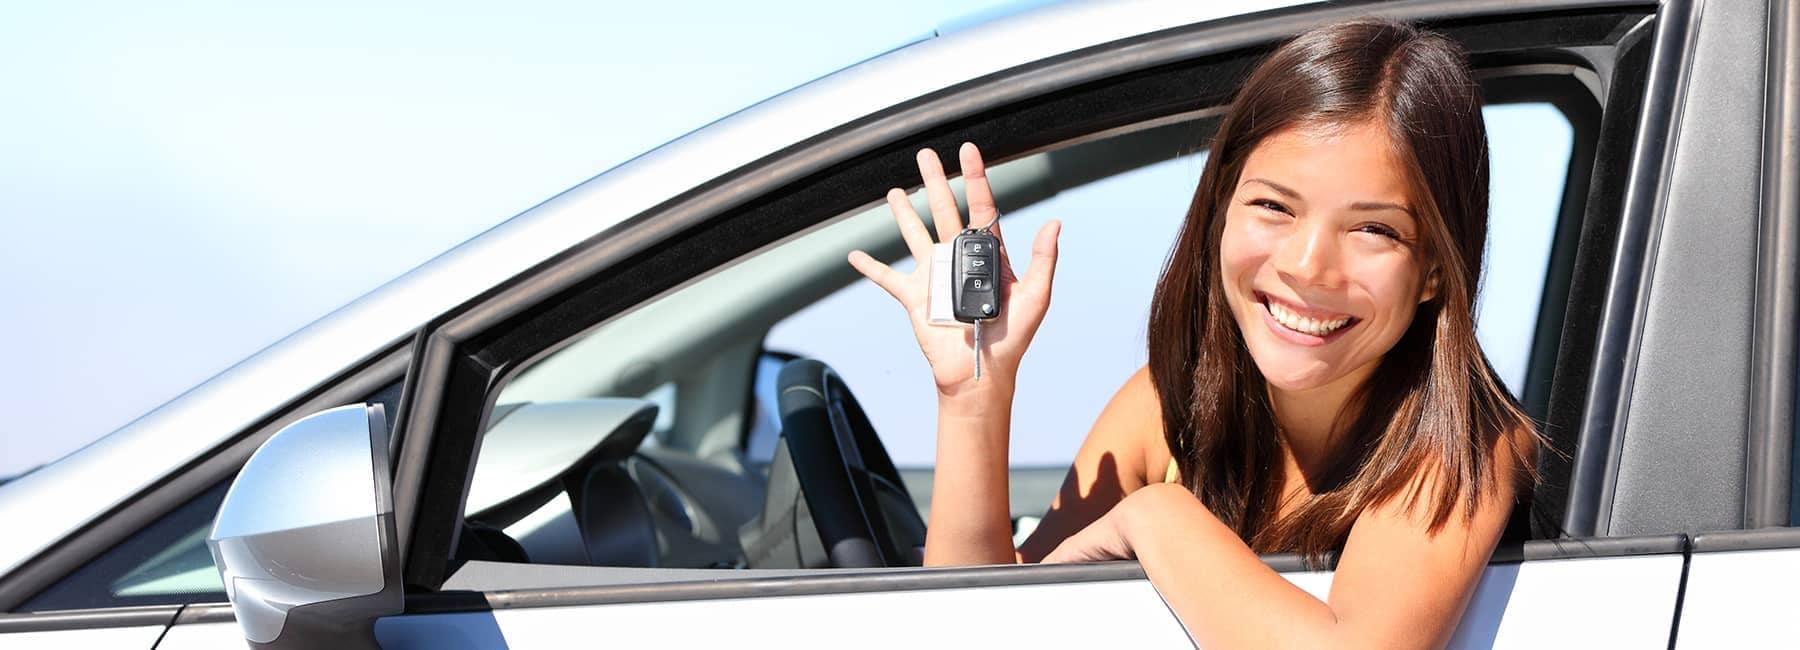 happy new car owner holding her keys